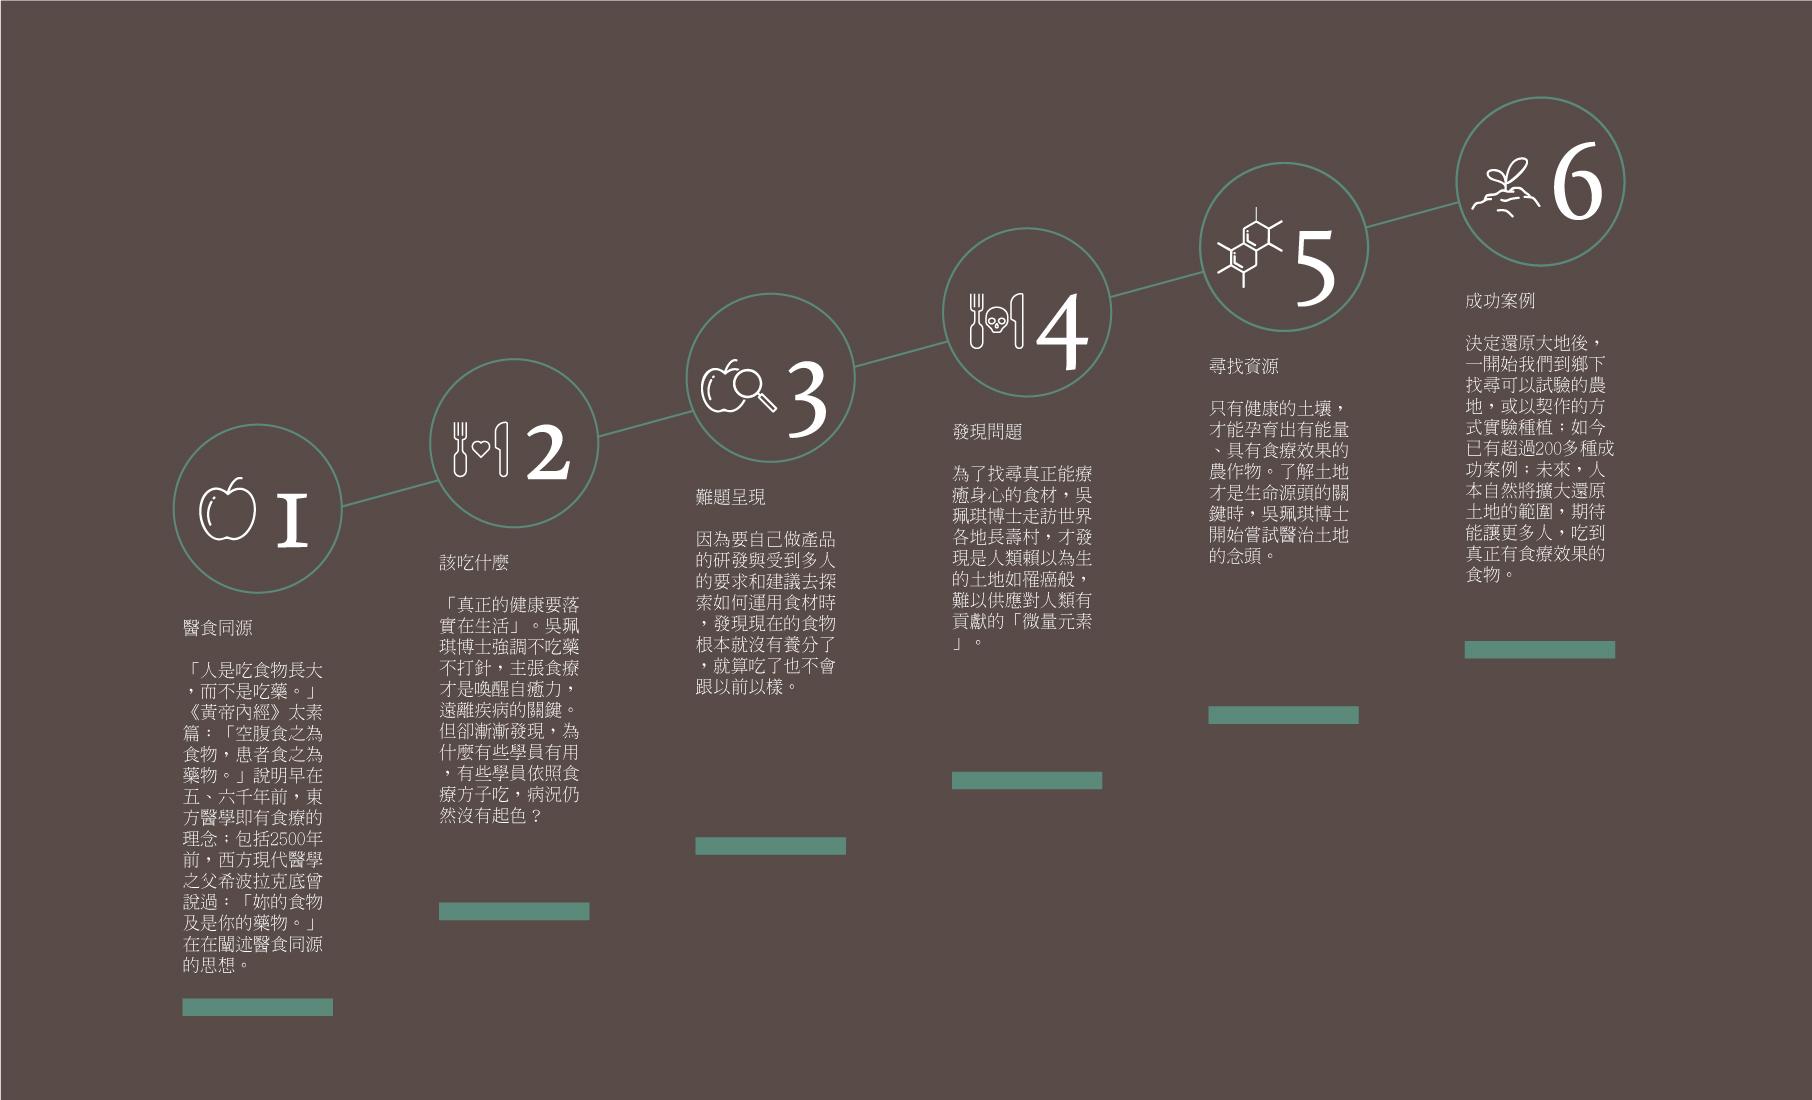 website-layout-bigger.jpg